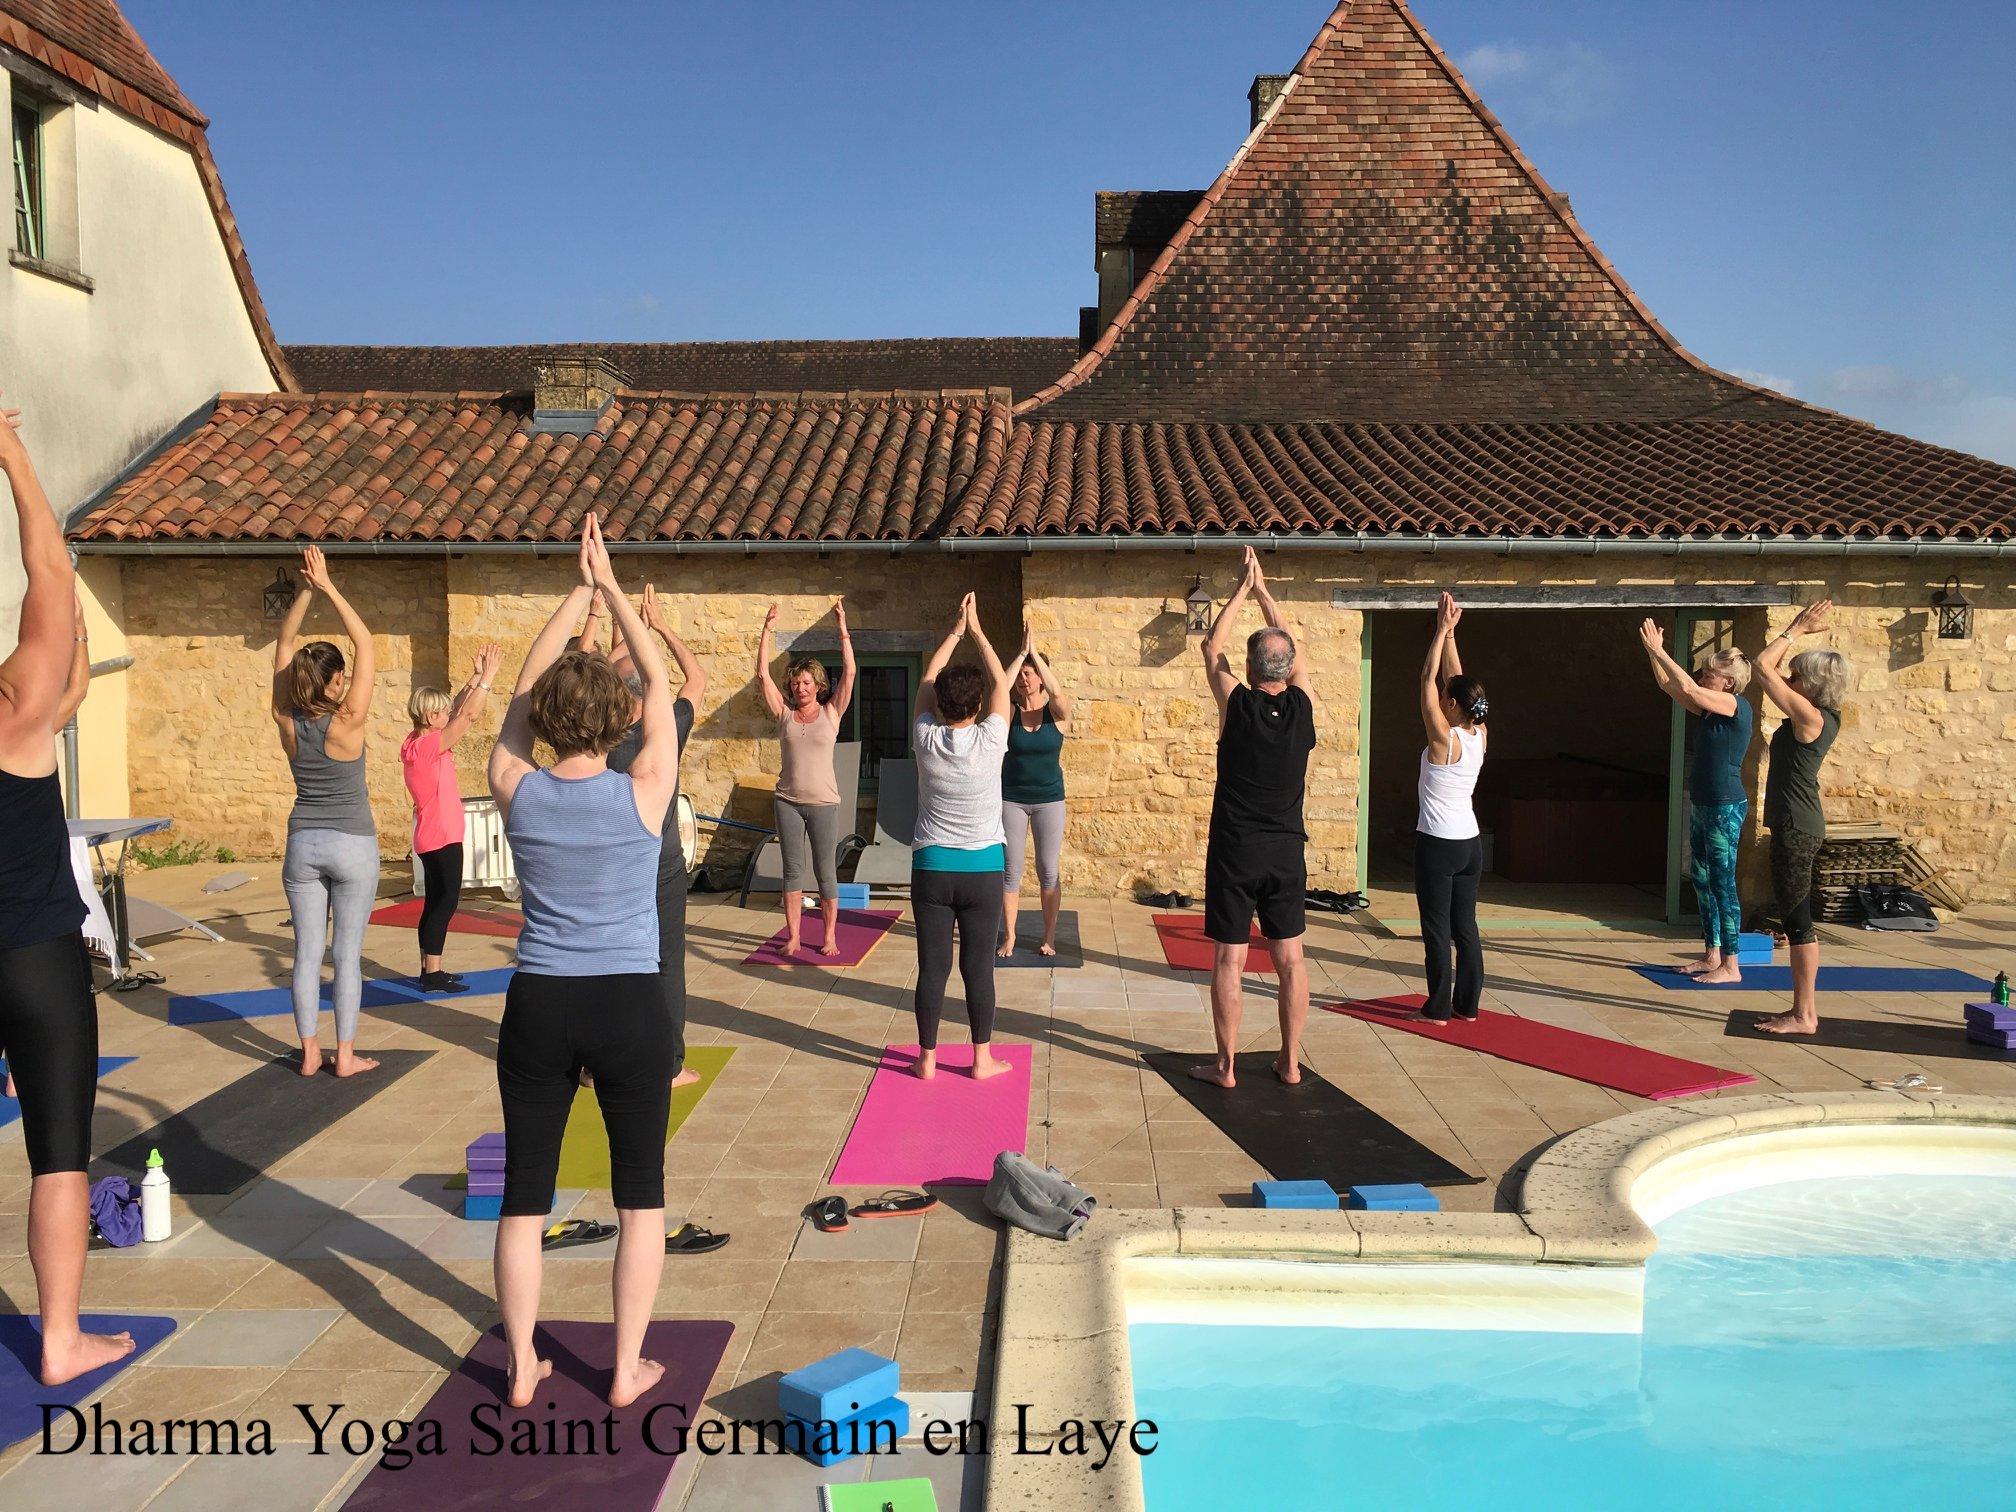 Dharma Yoga - Saint Germain en Laye 4